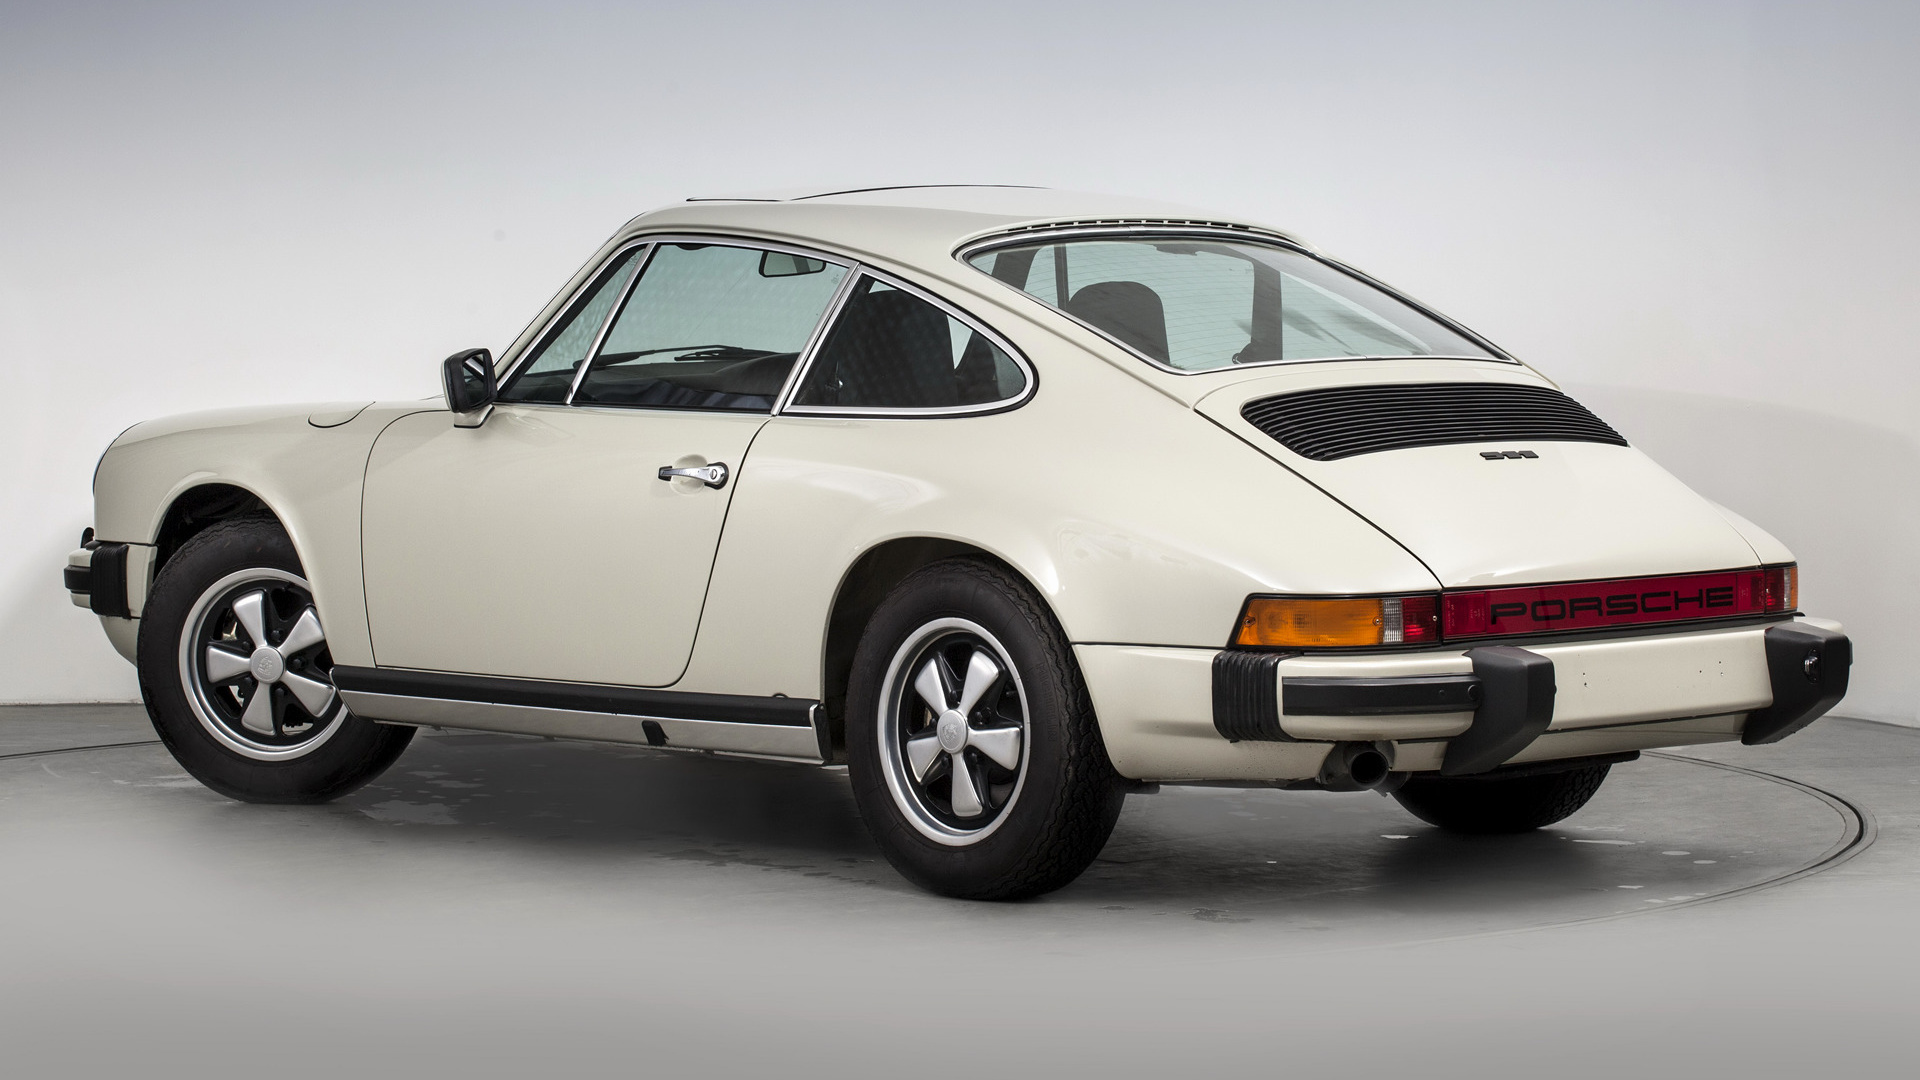 Porsche 911 (1973) UK Wallpapers and HD Images - Car Pixel